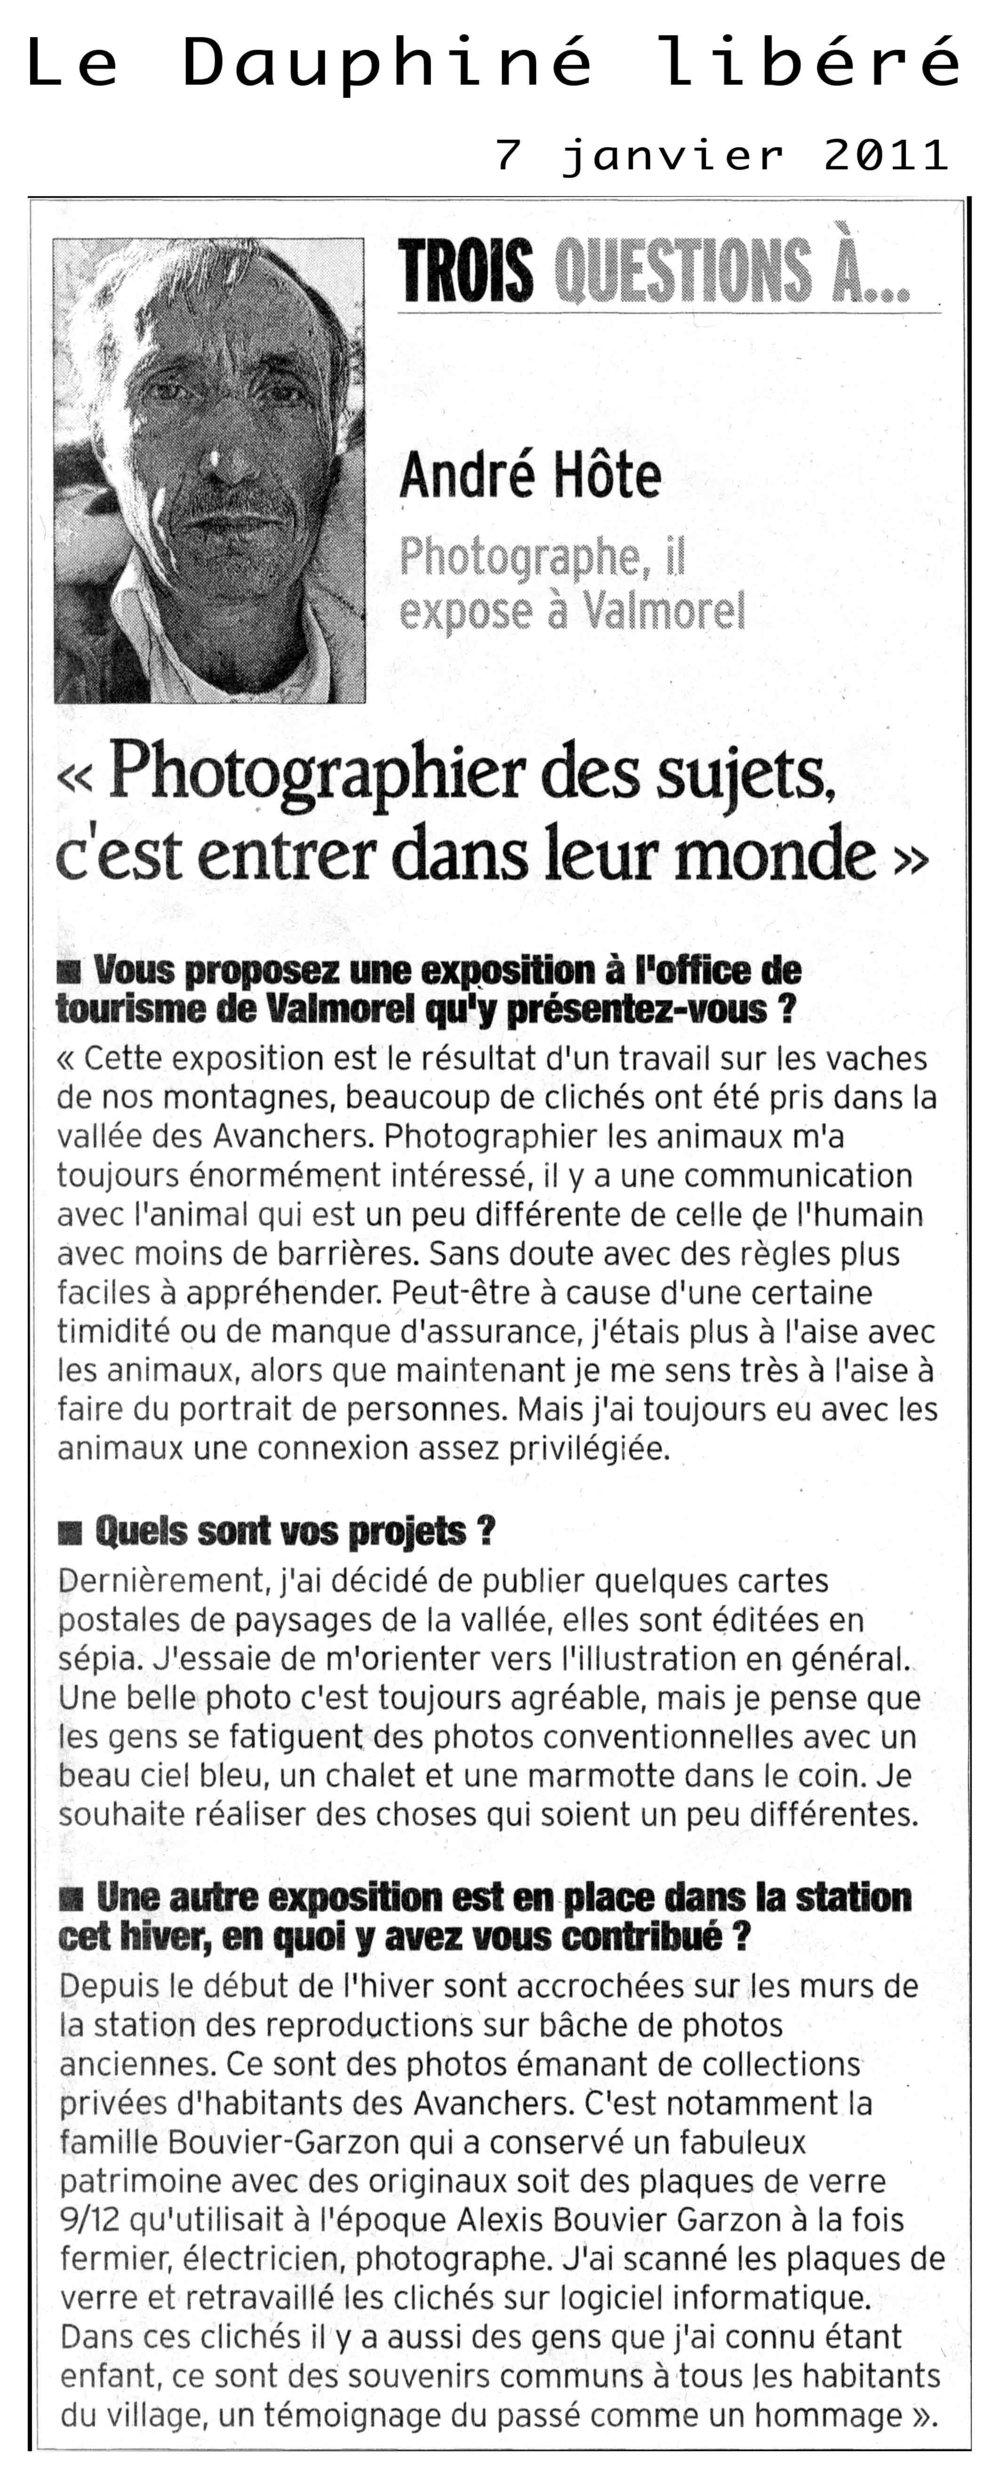 ARH - Le Dauphiné 7 janv 11.jpg